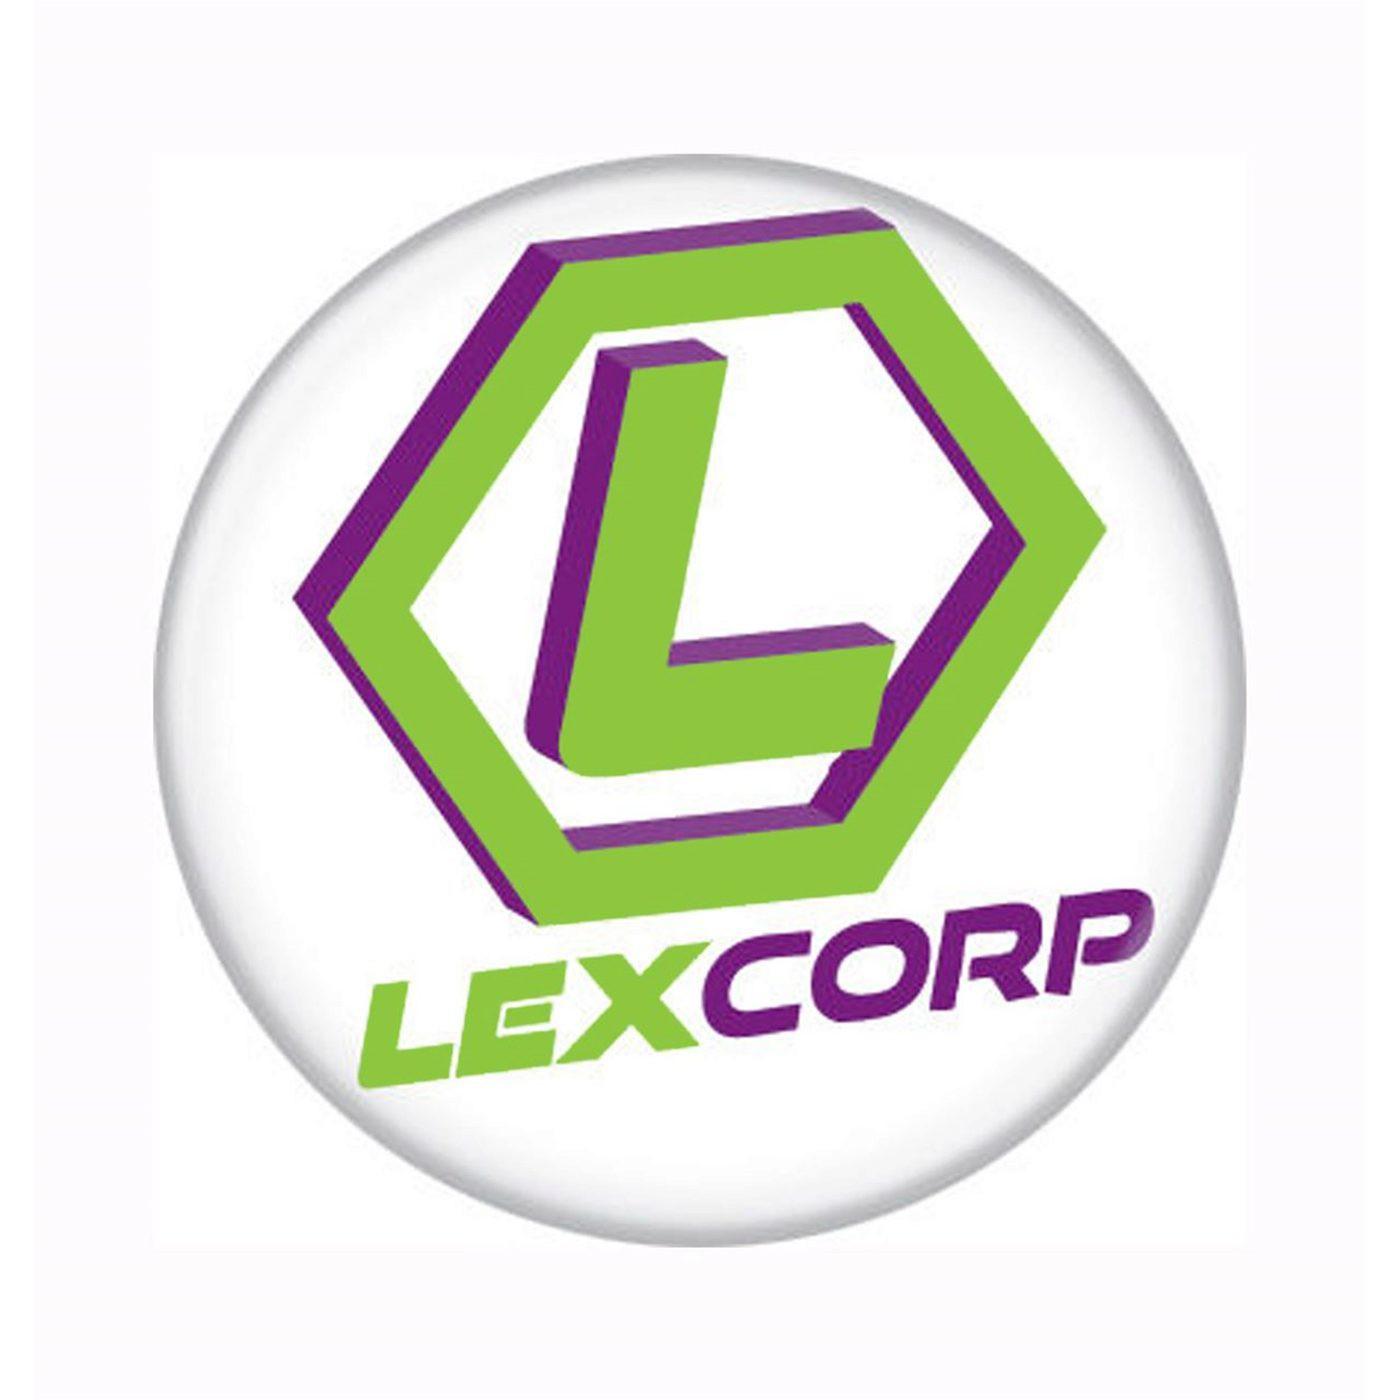 Lex Corp Button